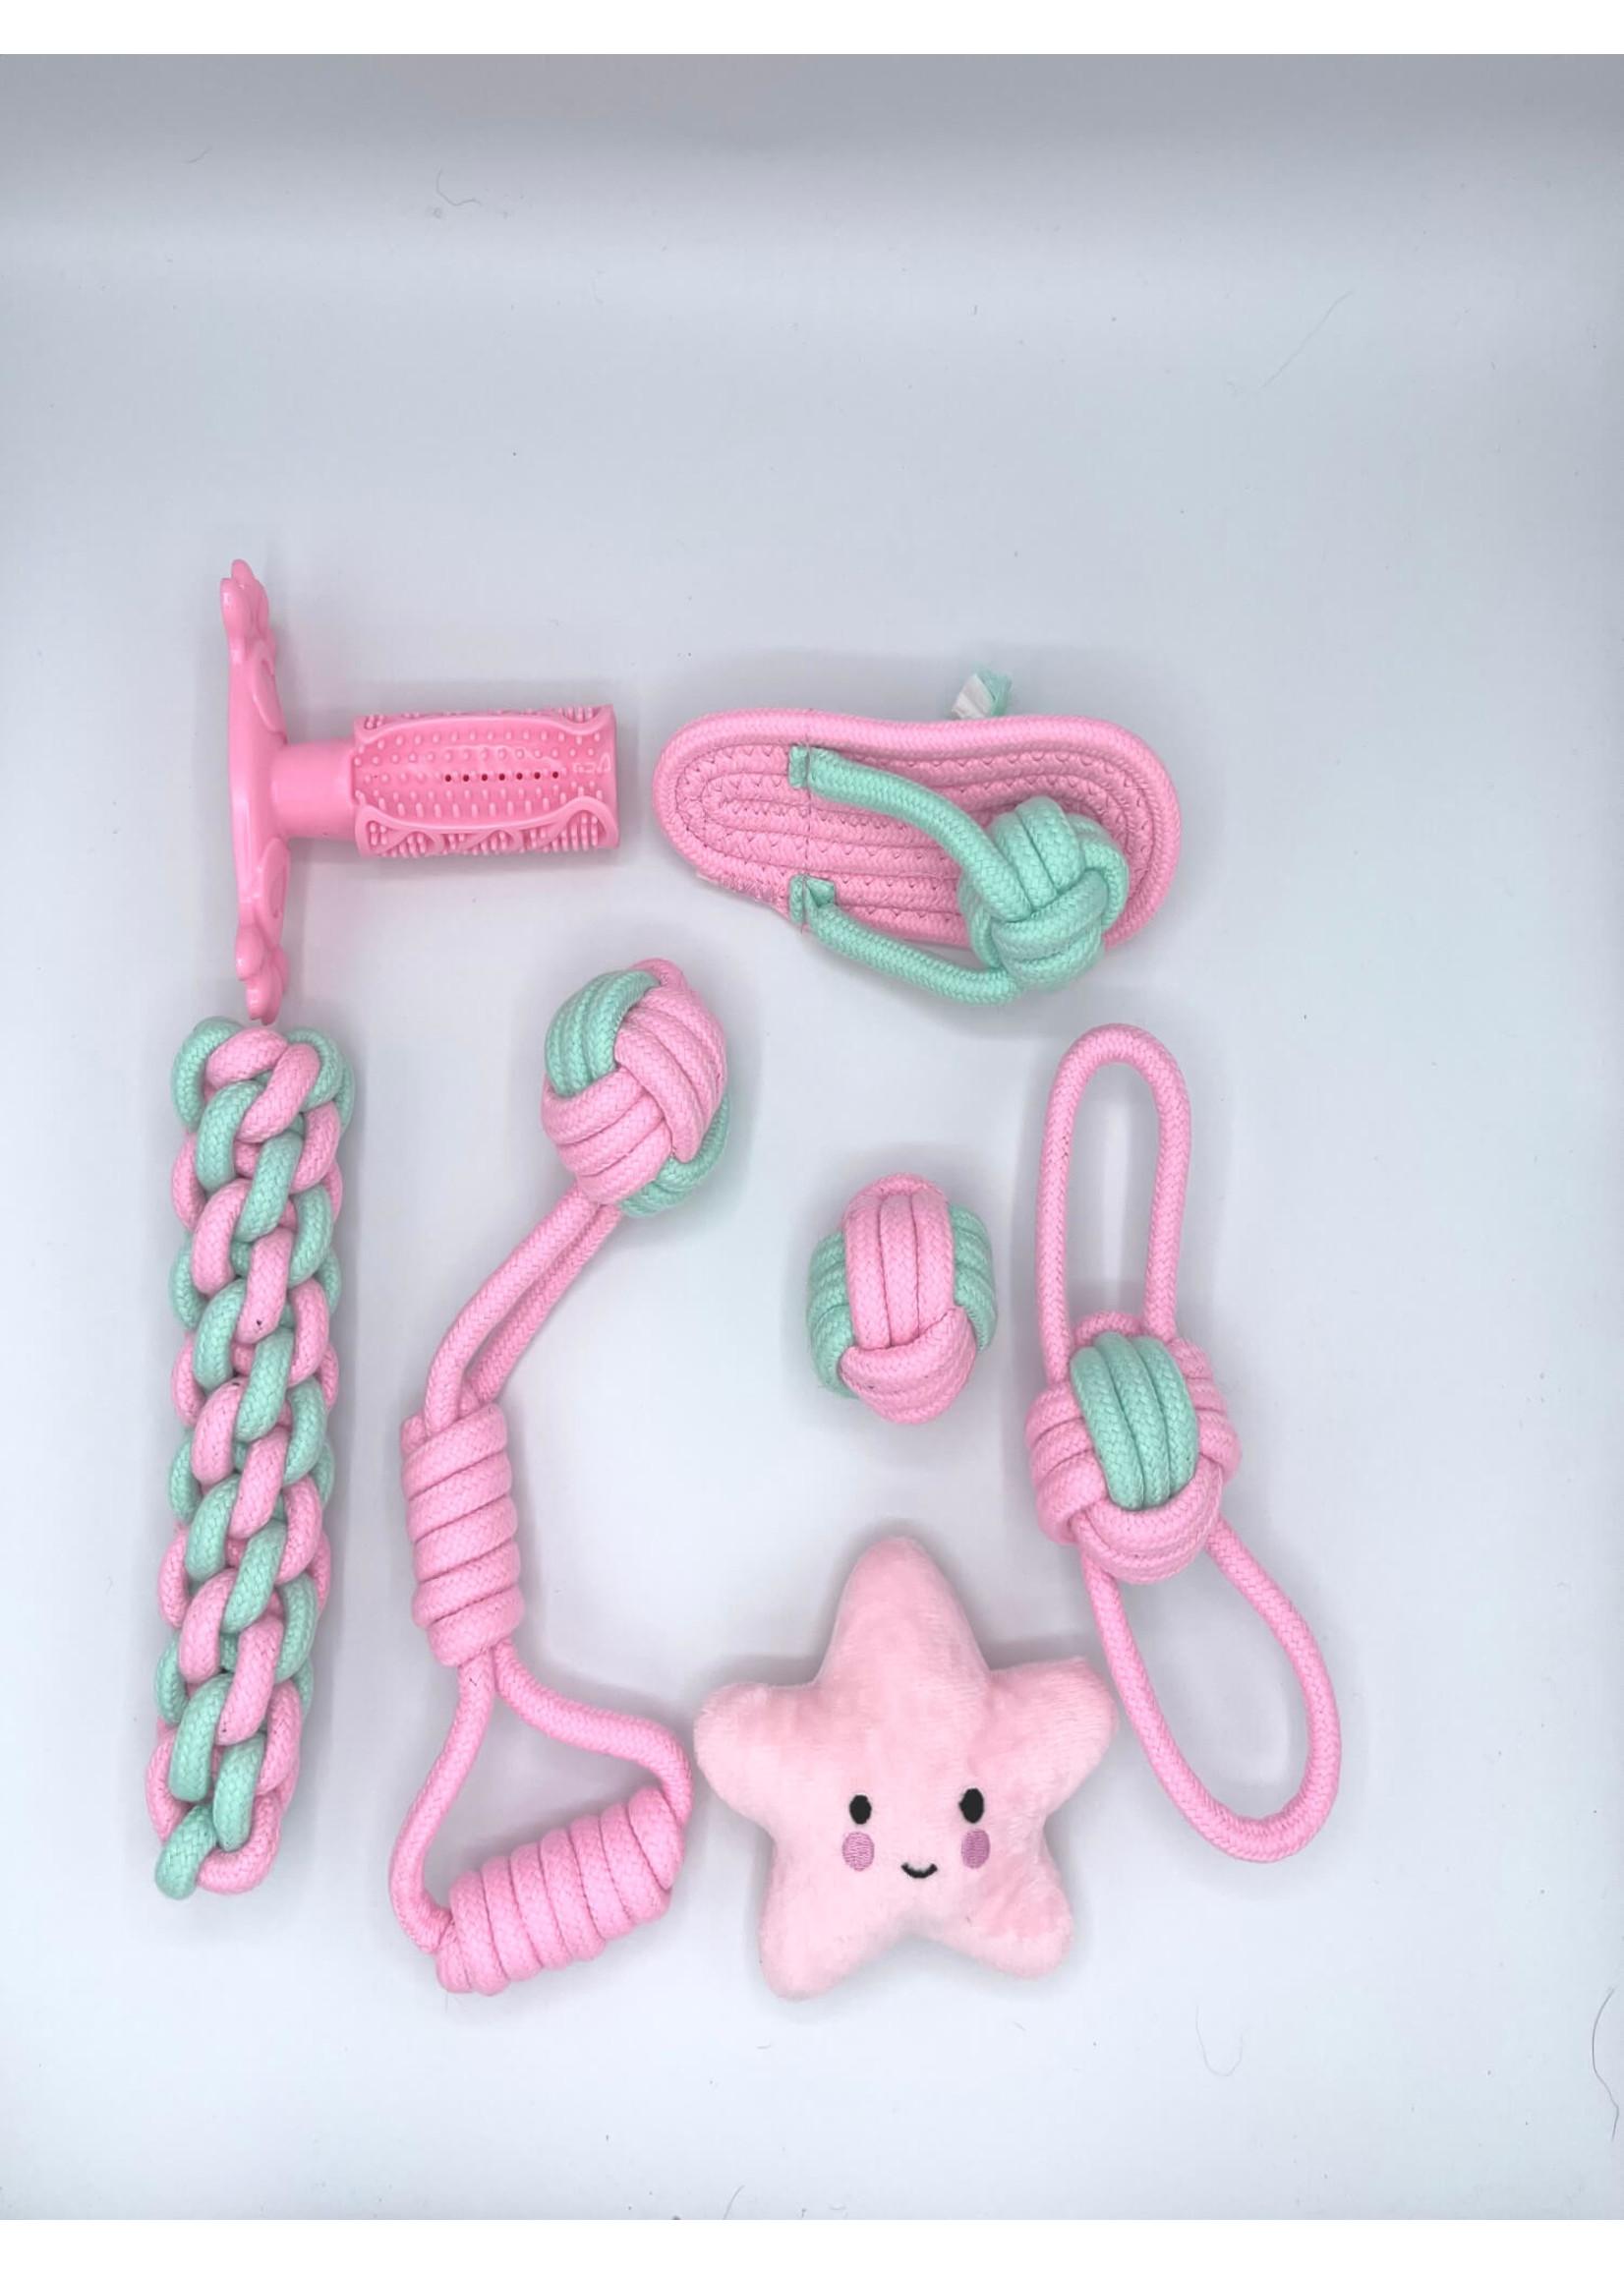 7 Piece Pink Dog Toy Set